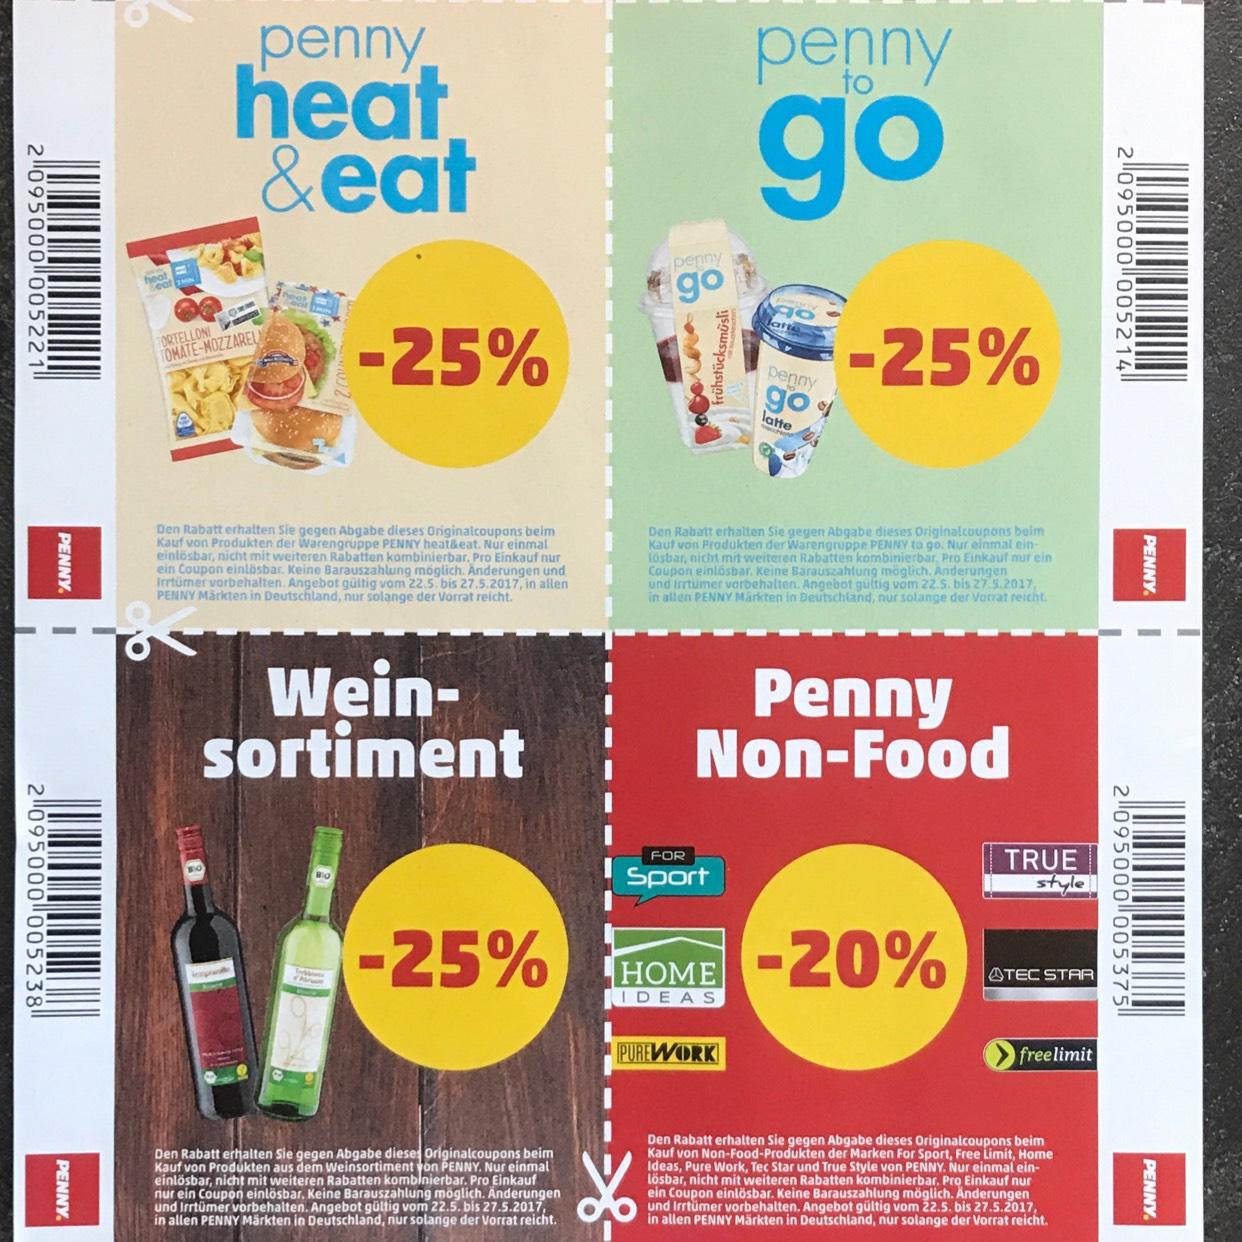 Penny 20 - 25% auf Penny Eigenmarke